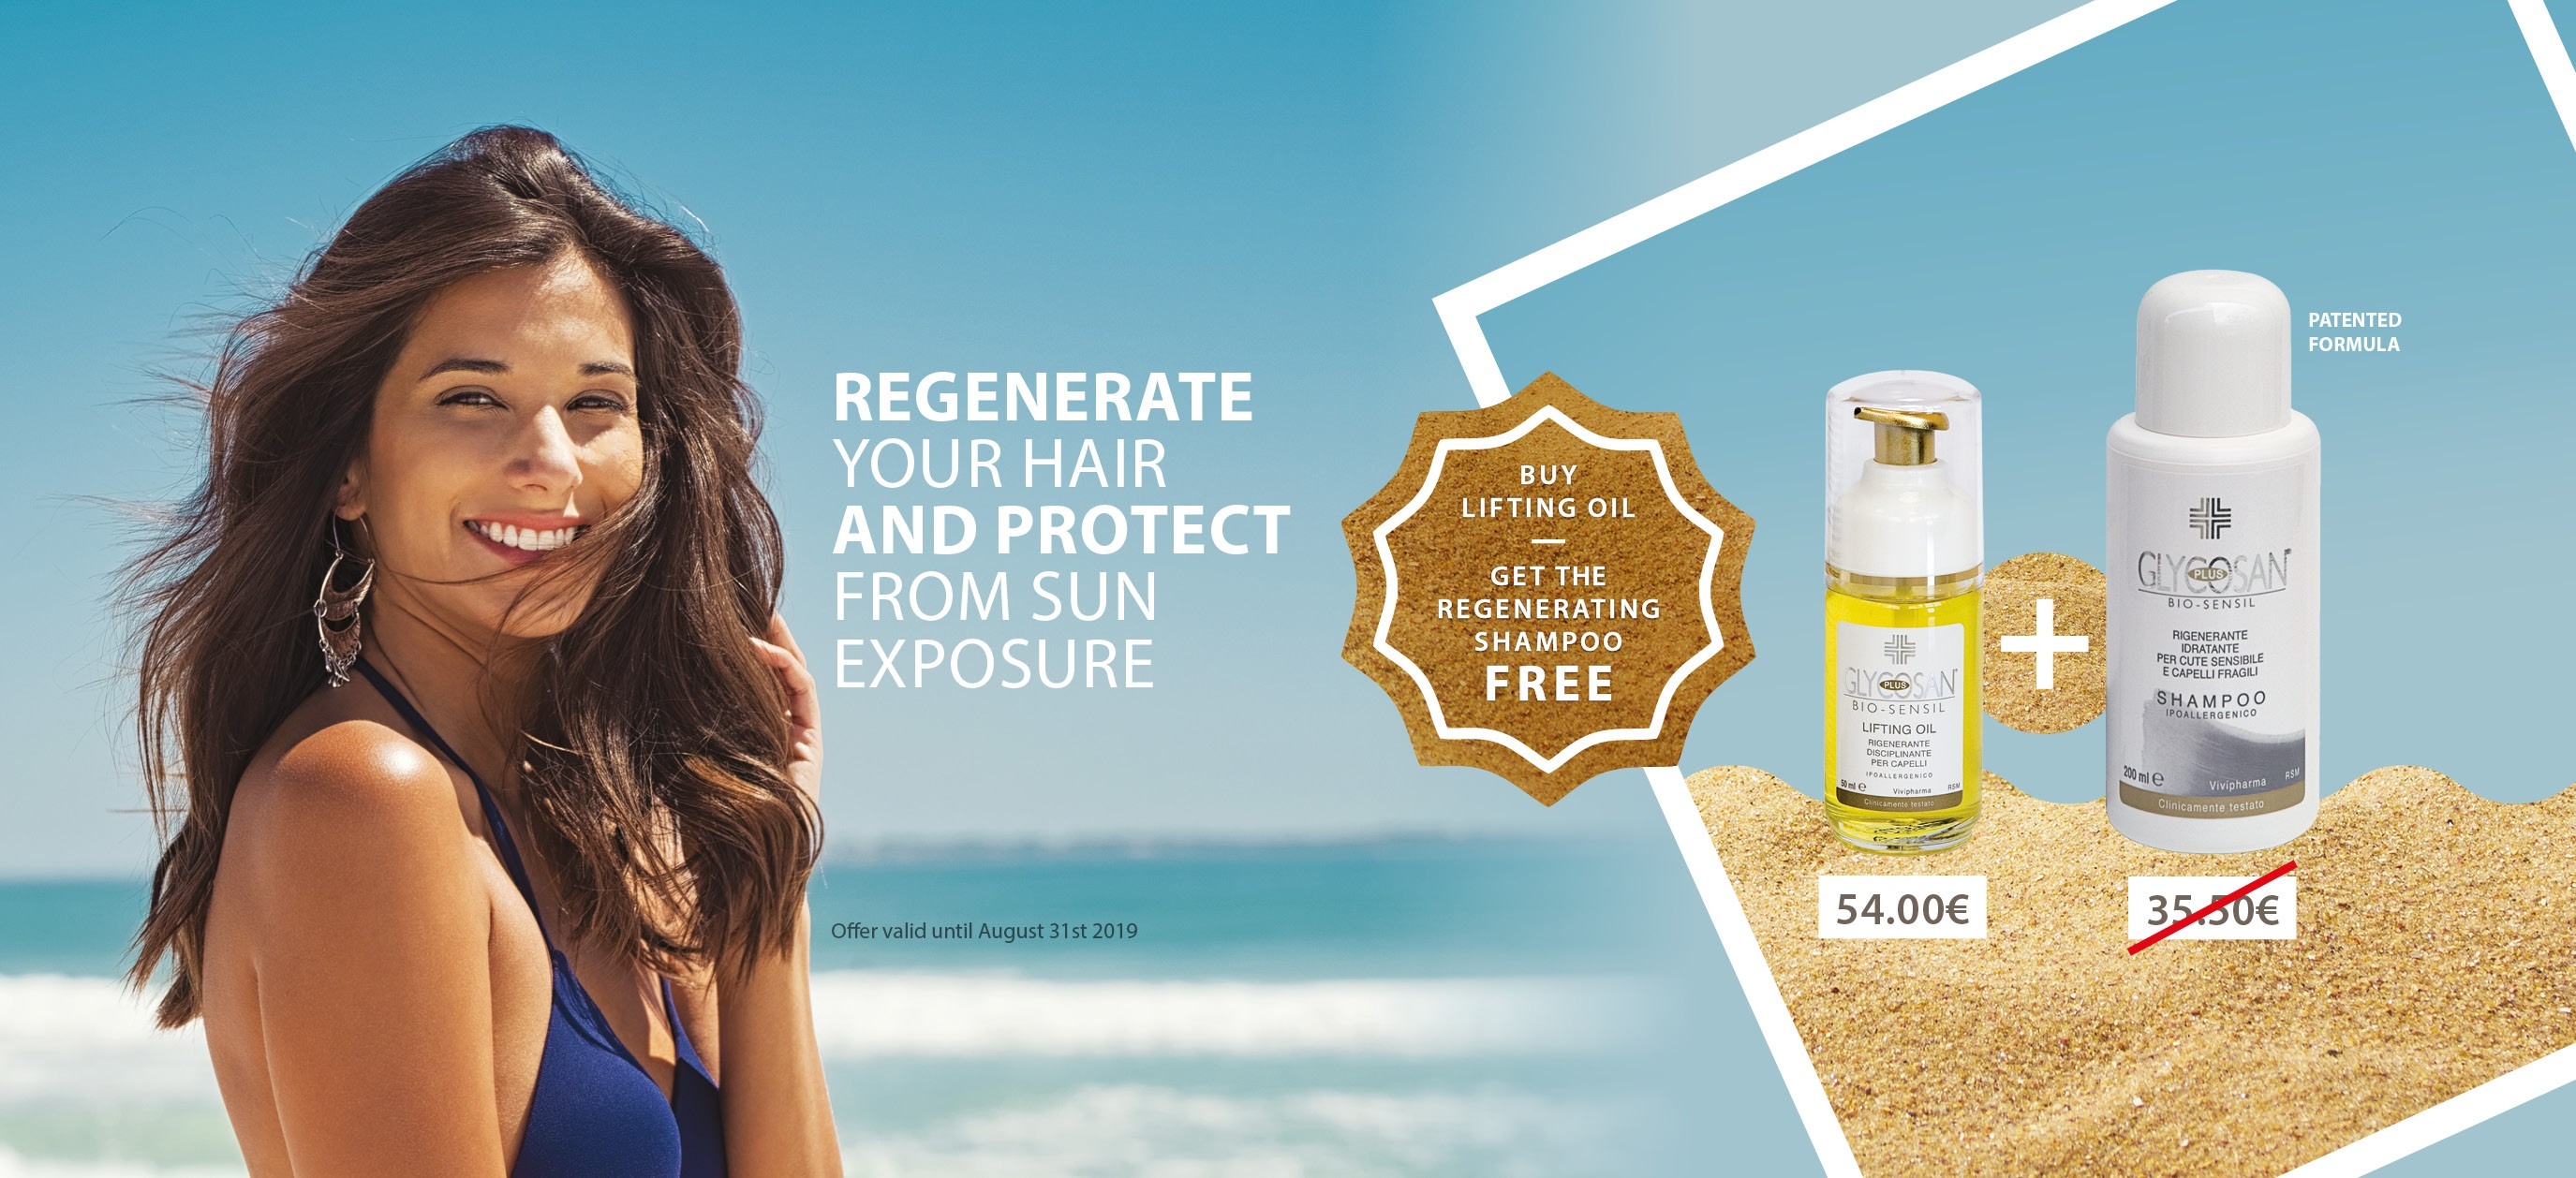 buy Lifting Oil Get the Regenerating shampoo Free